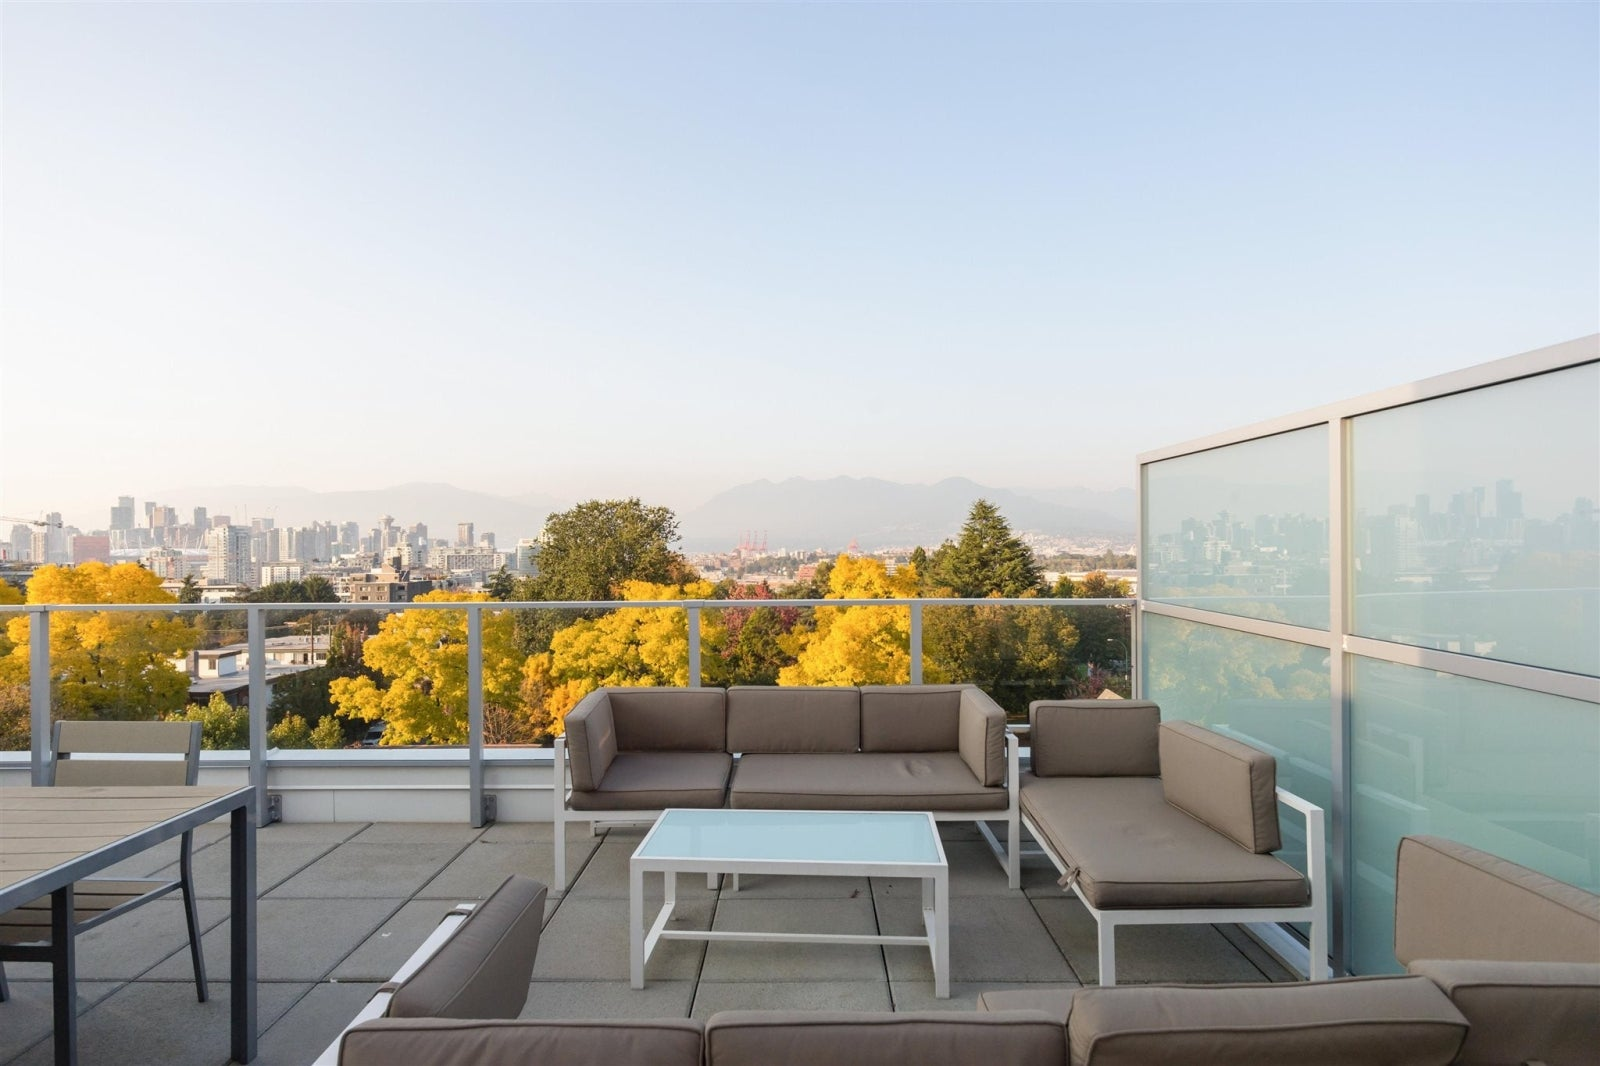 408 379 E BROADWAY AVENUE - Mount Pleasant VE Apartment/Condo for sale, 2 Bedrooms (R2599900) #26